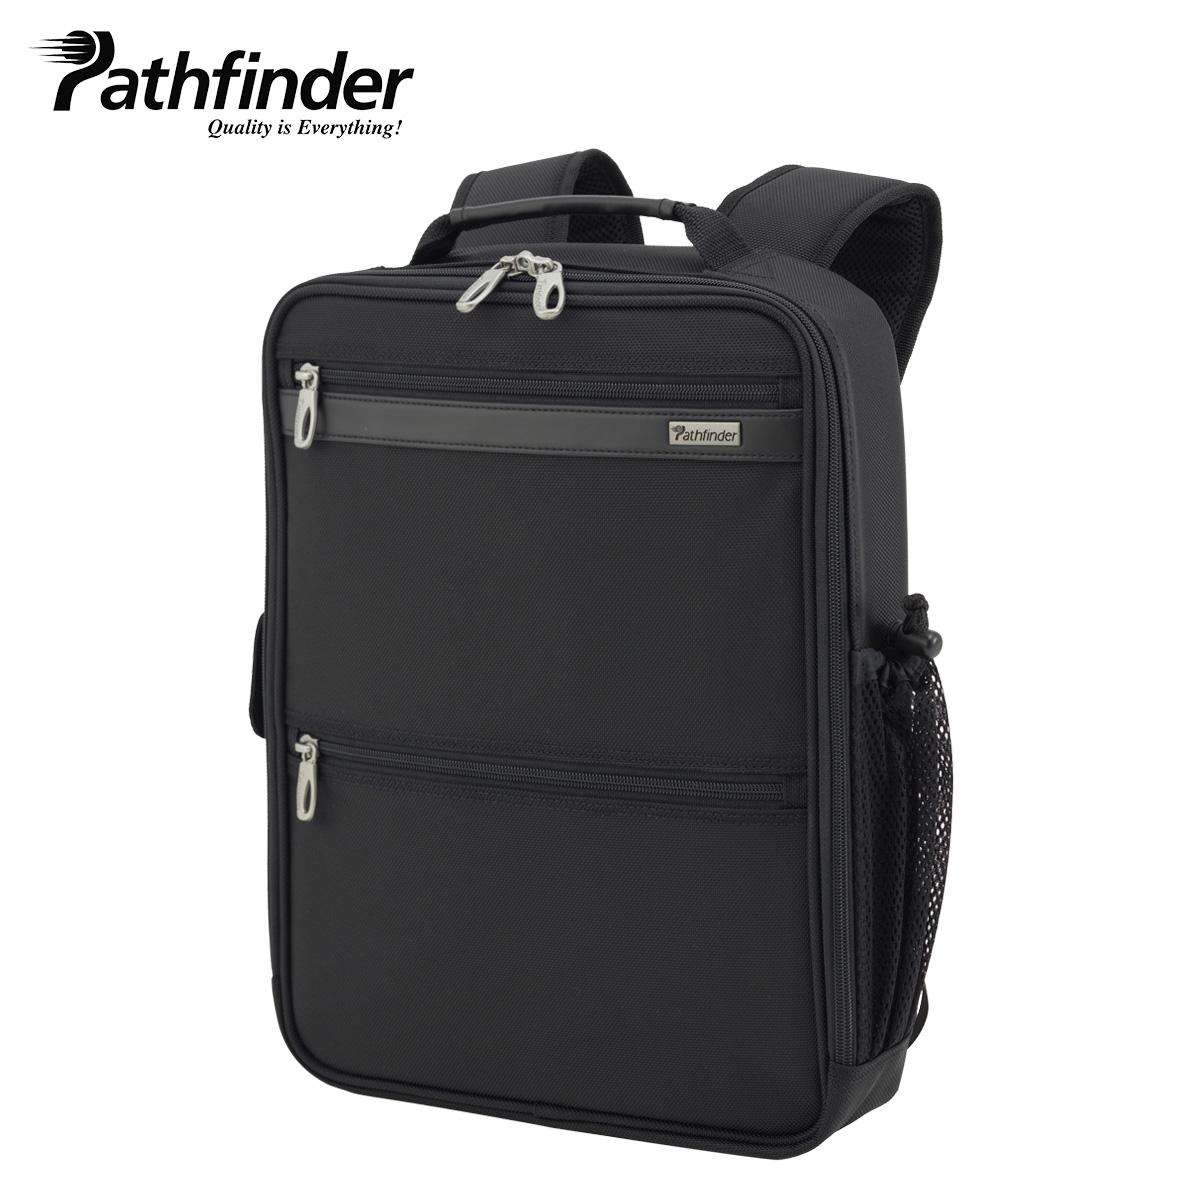 Pathfinder パスファインダー バッグ ビジネスバッグ リュック バックパック メンズ AVENGER ブラック 黒 PF1841B